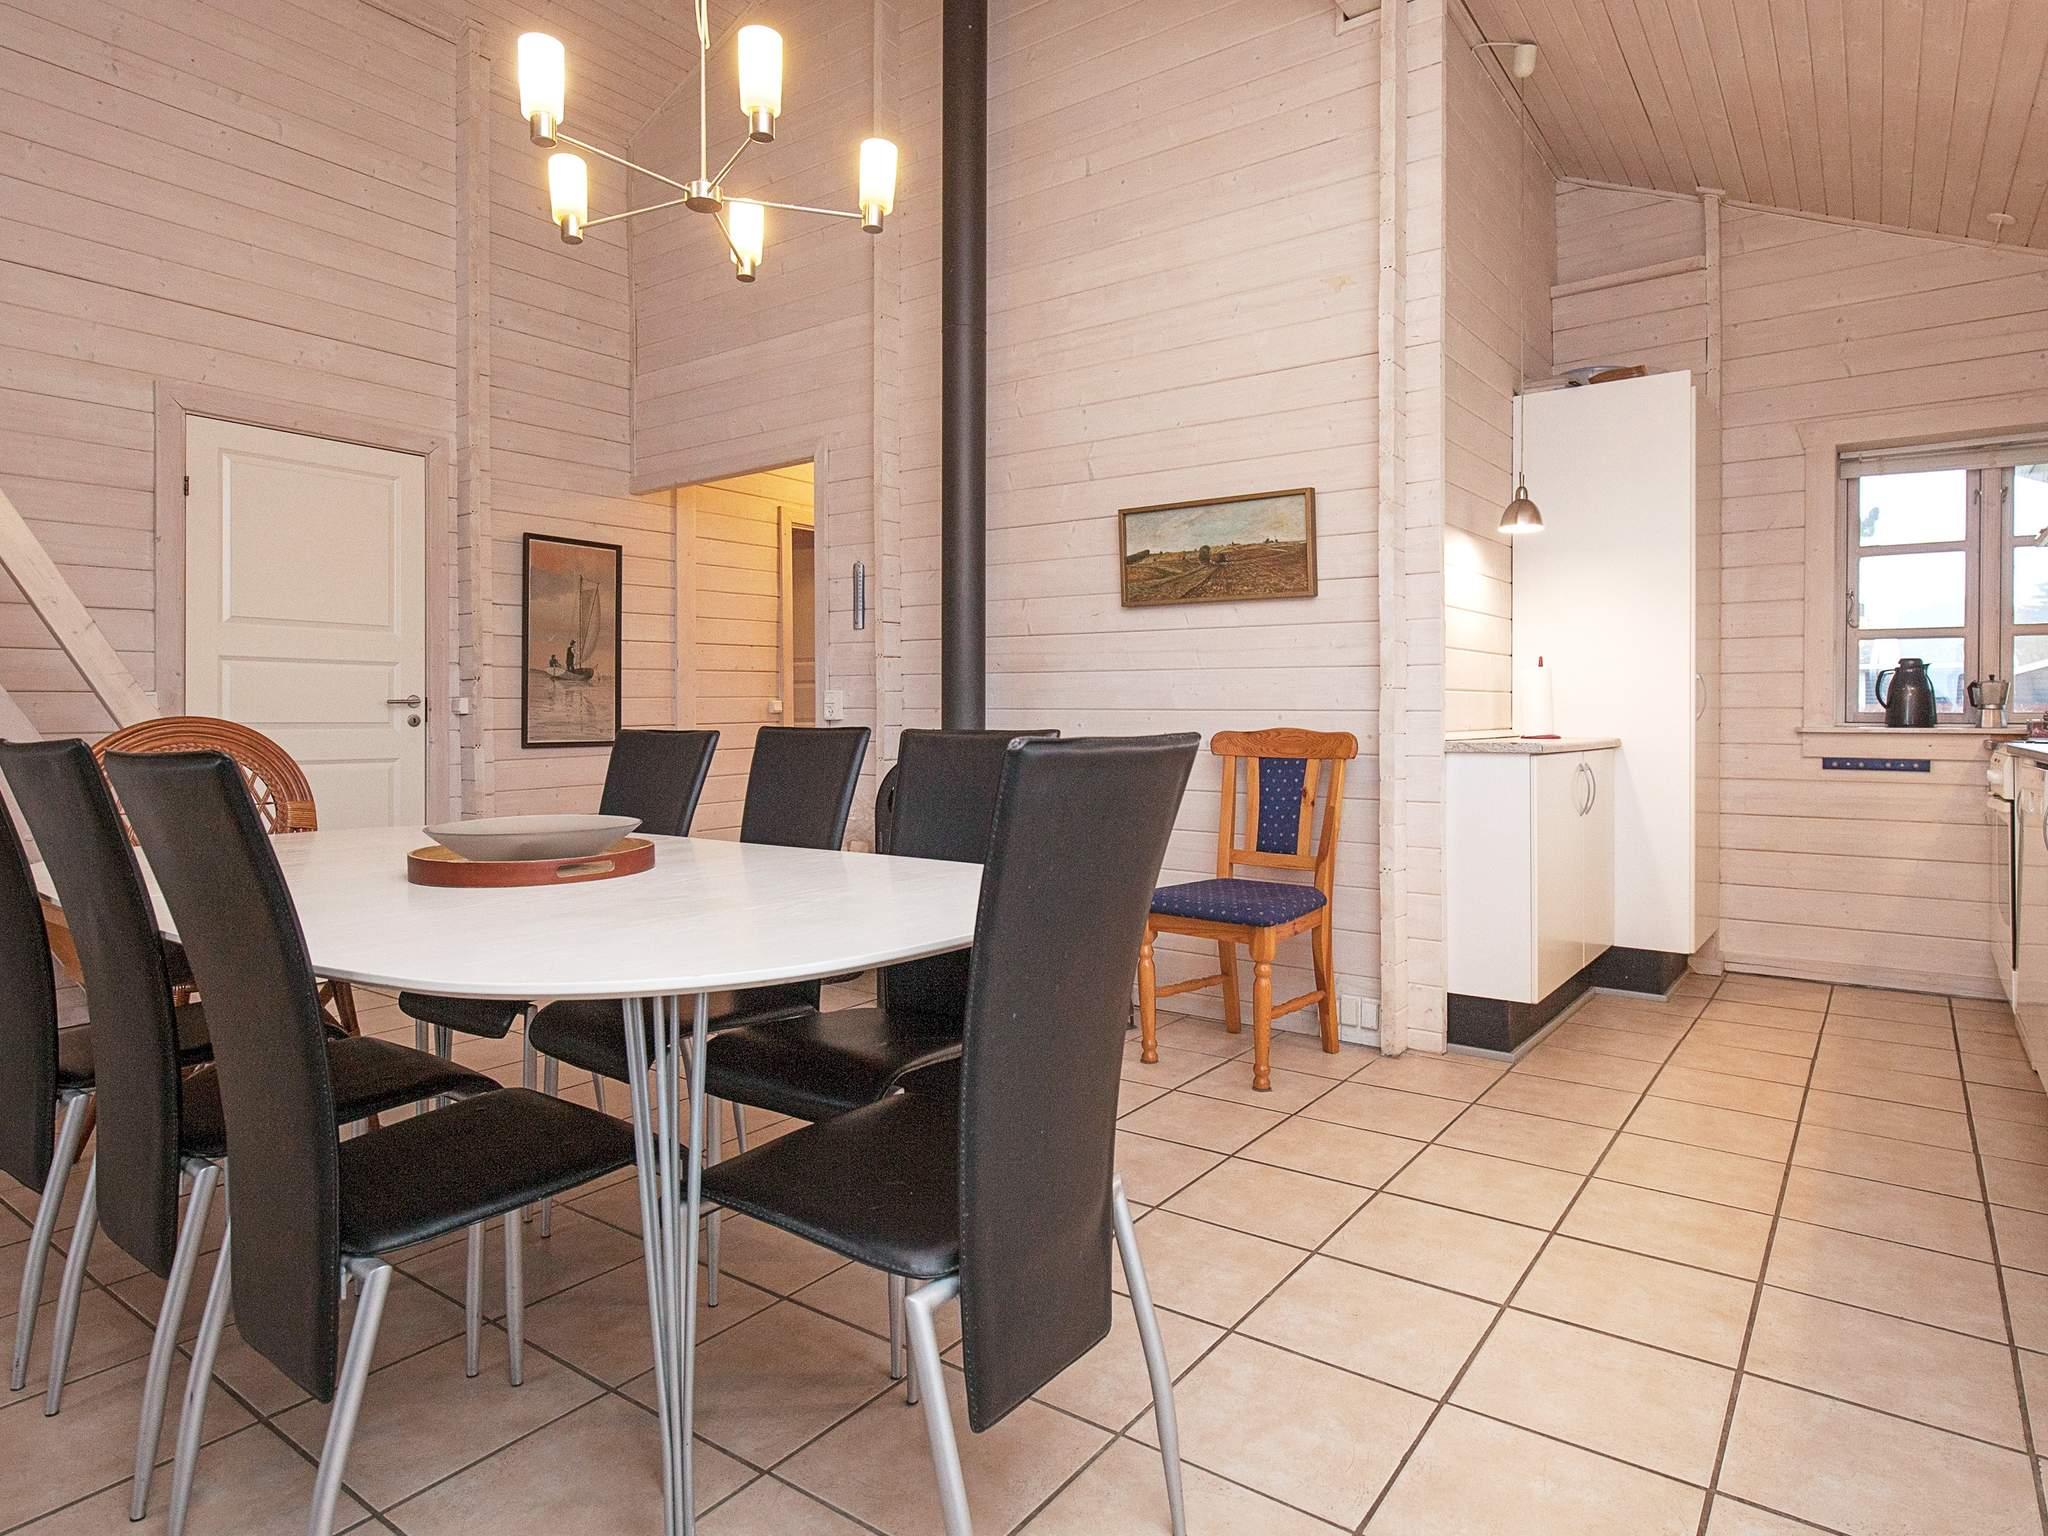 Ferienhaus Røsnæs (264063), Kalundborg, , Westseeland, Dänemark, Bild 8